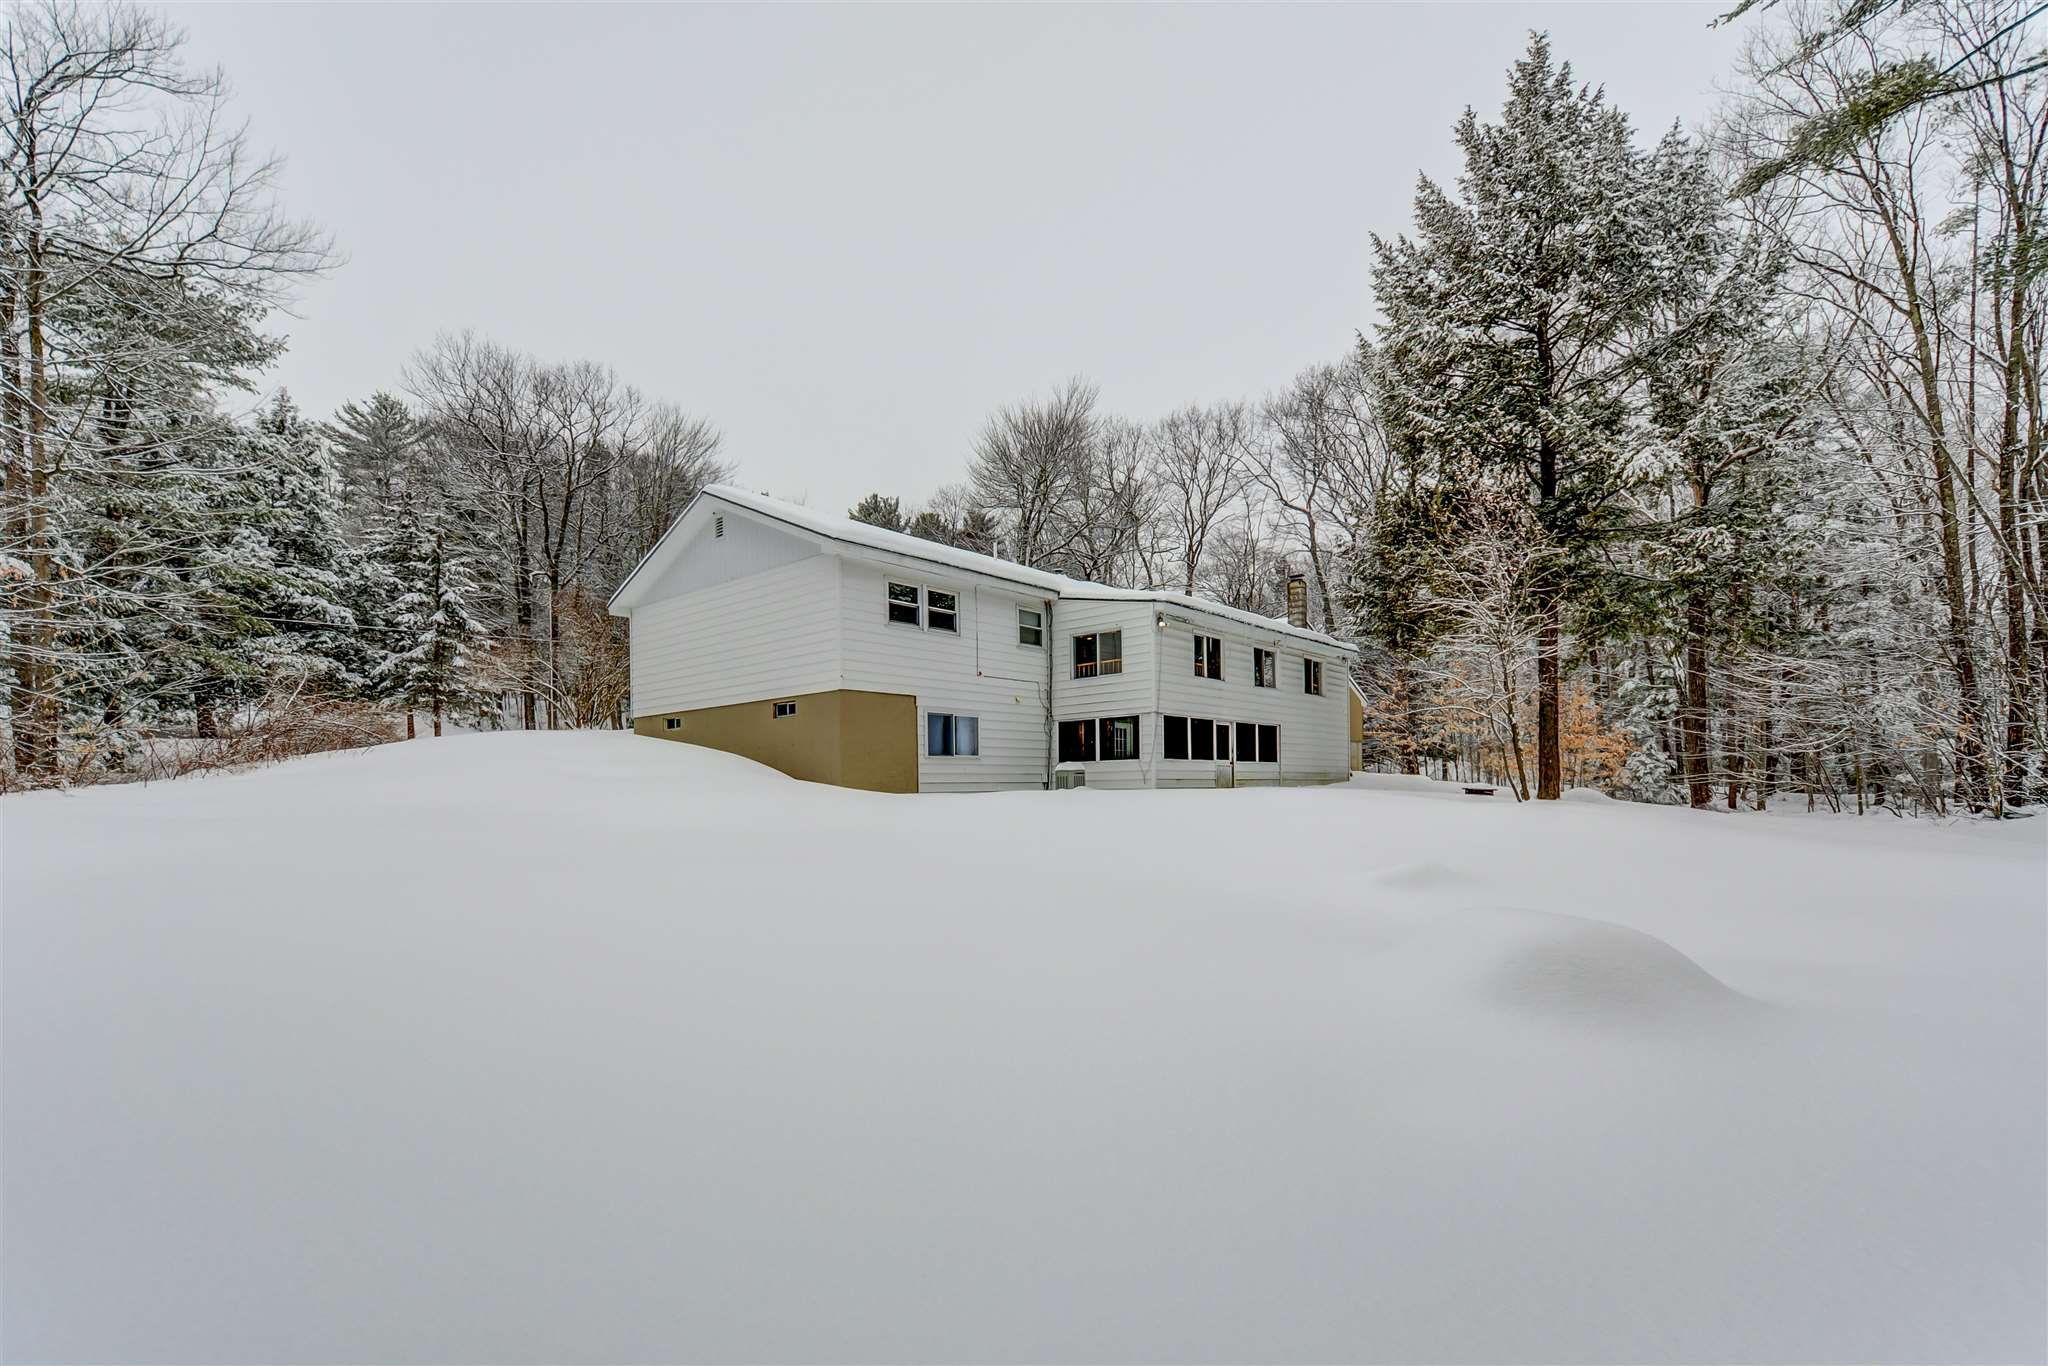 49 Merrill Drive, Conway, NH 03860 | Pinkham Real Estate